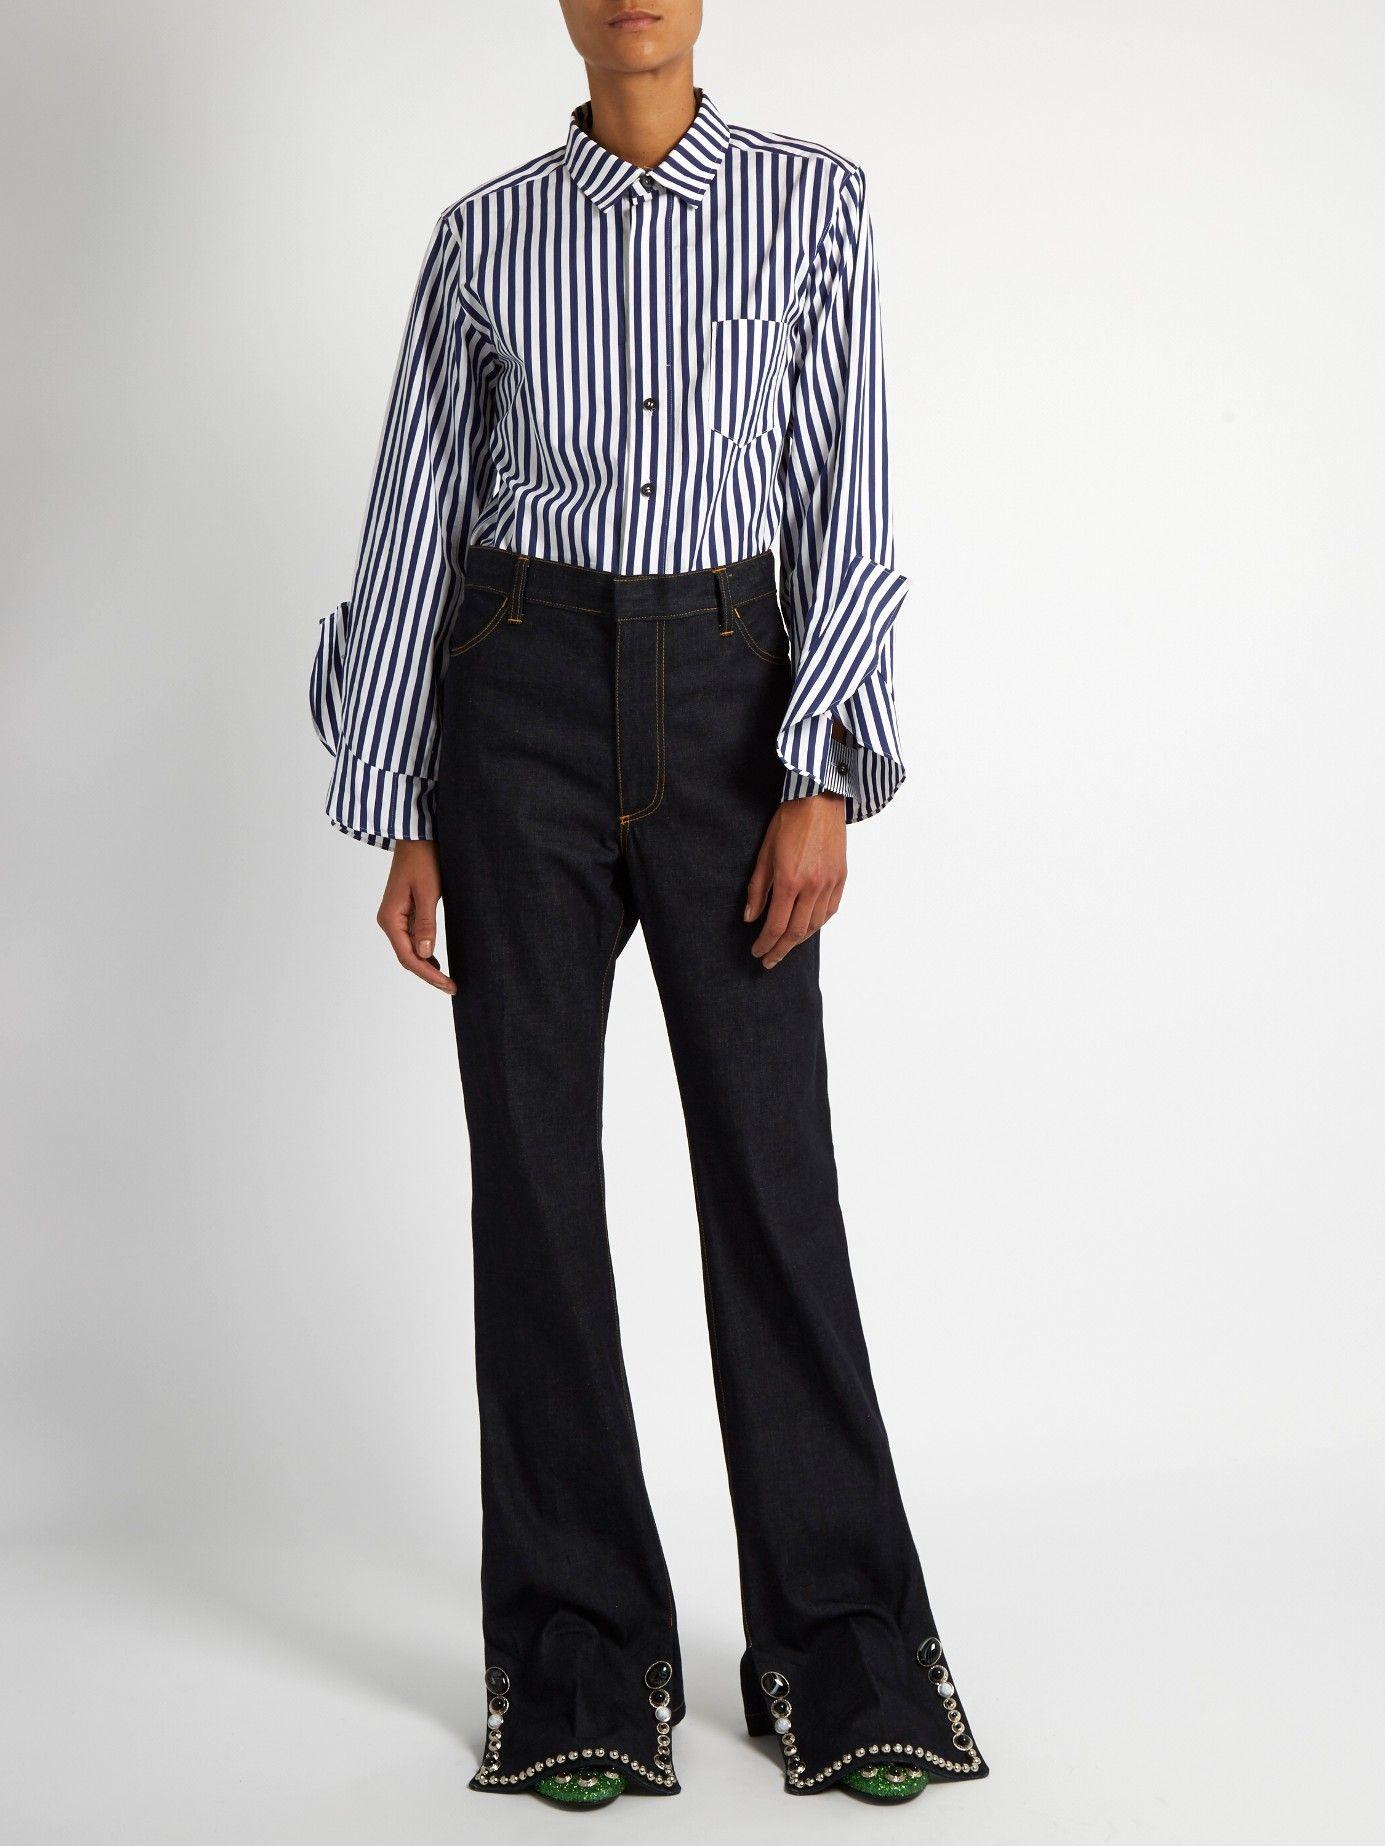 Ruffled-cuff striped cotton shirt | Toga | MATCHESFASHION.COM US